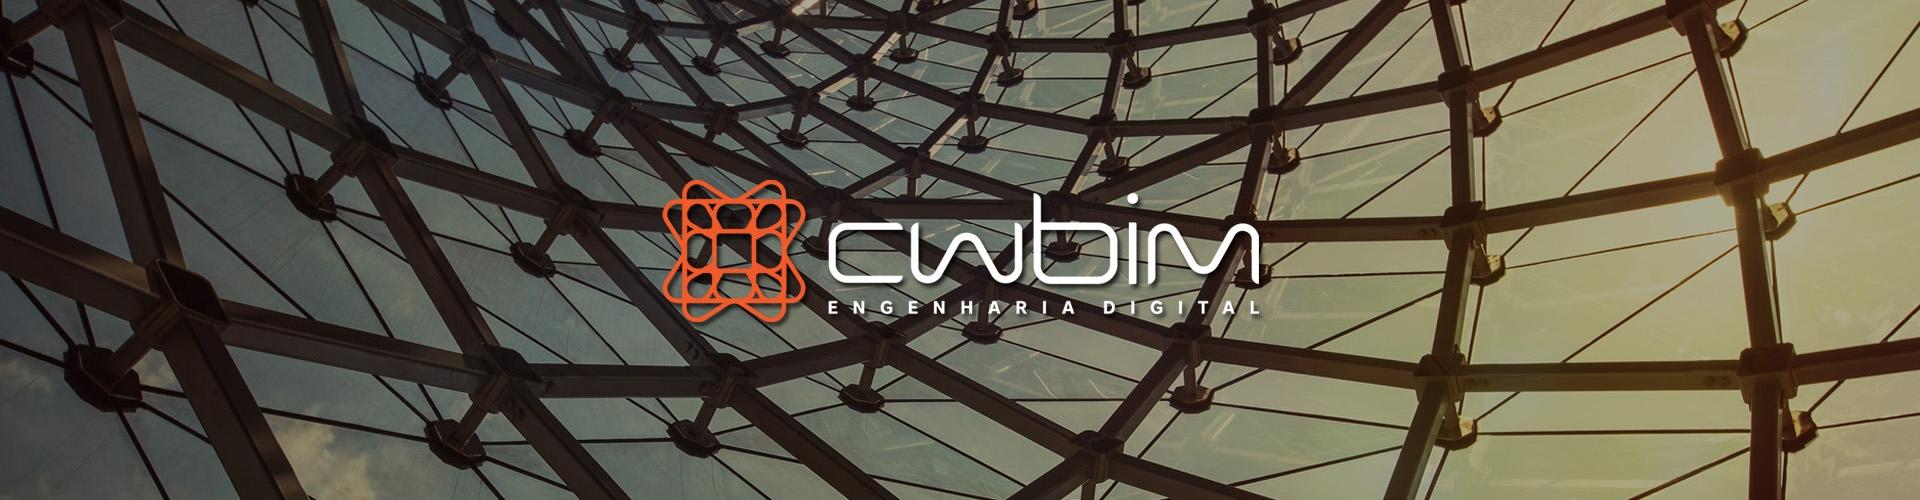 slider-cwbim2